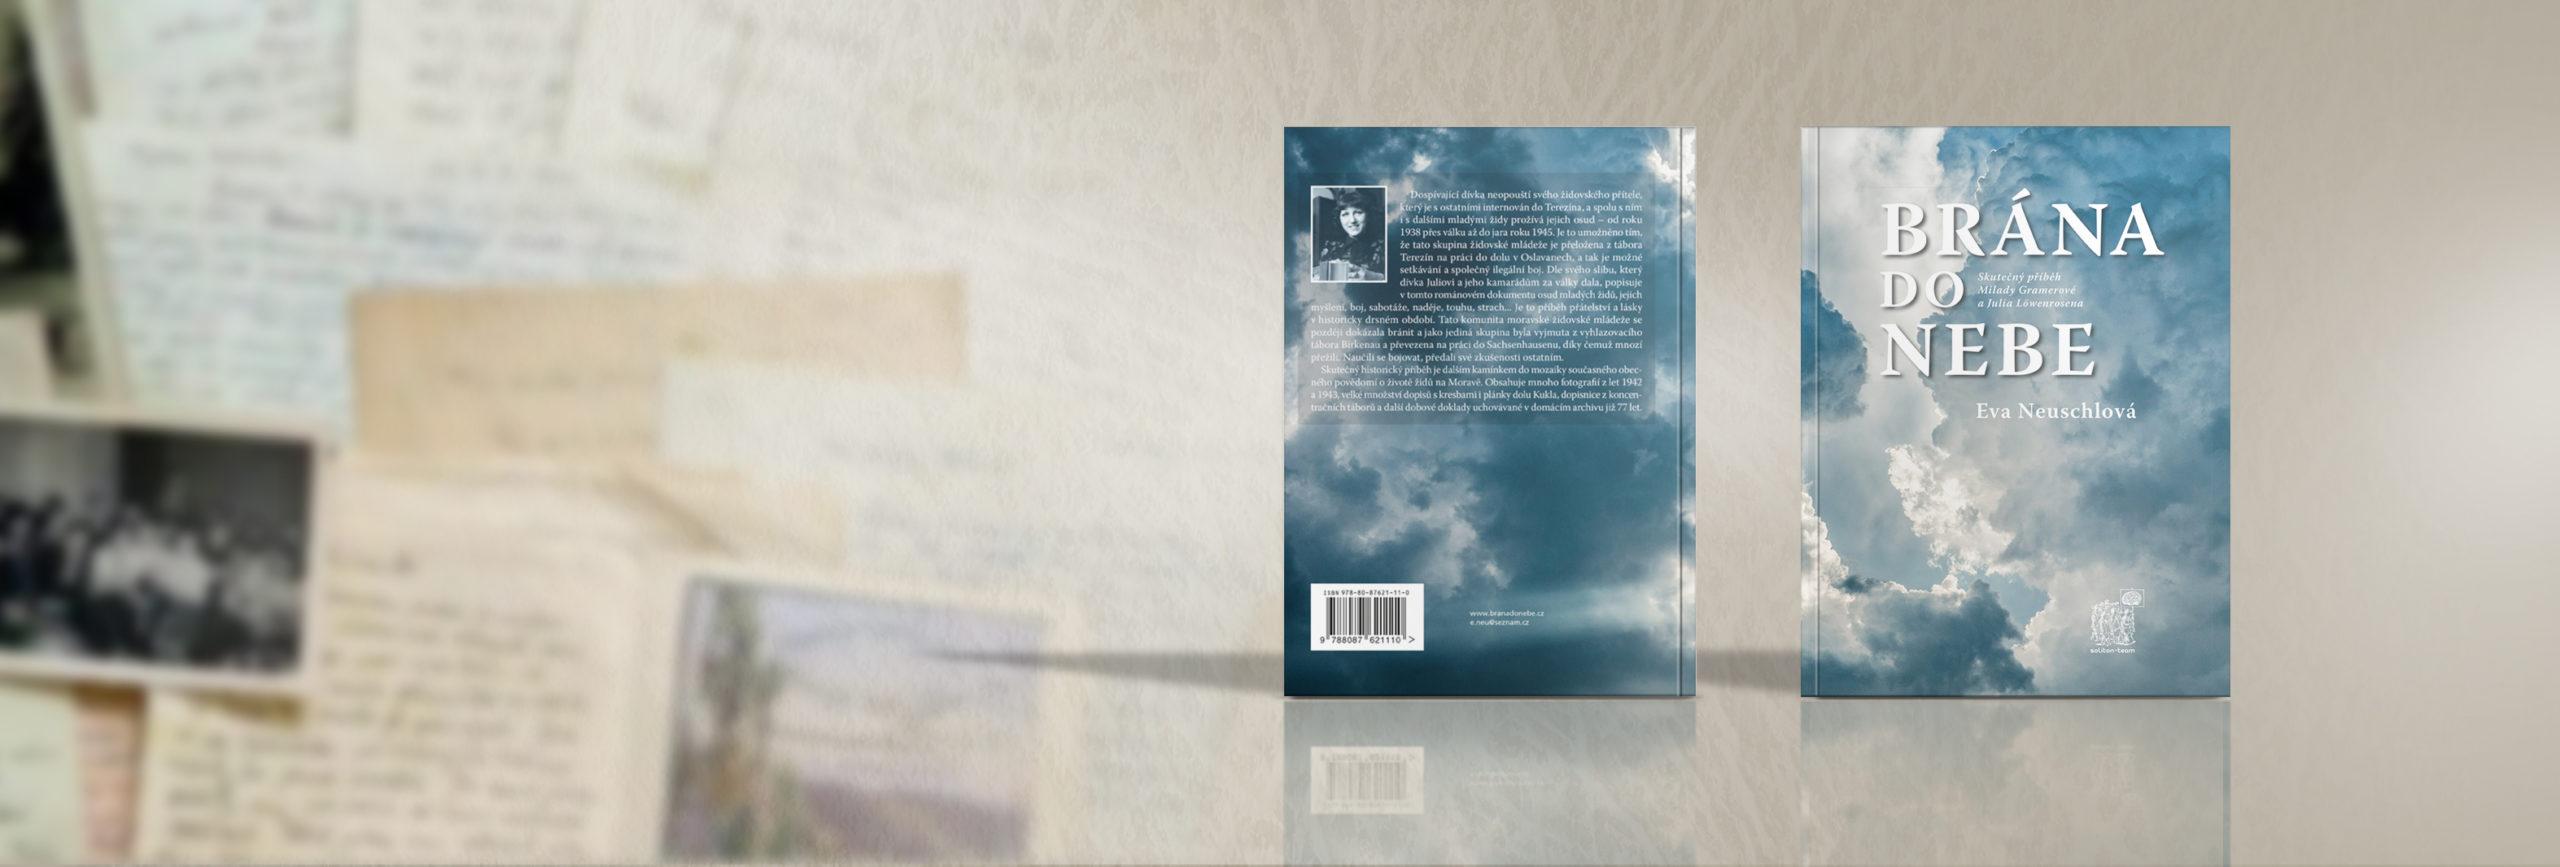 Kniha s fotkami a dopisy v pozadí